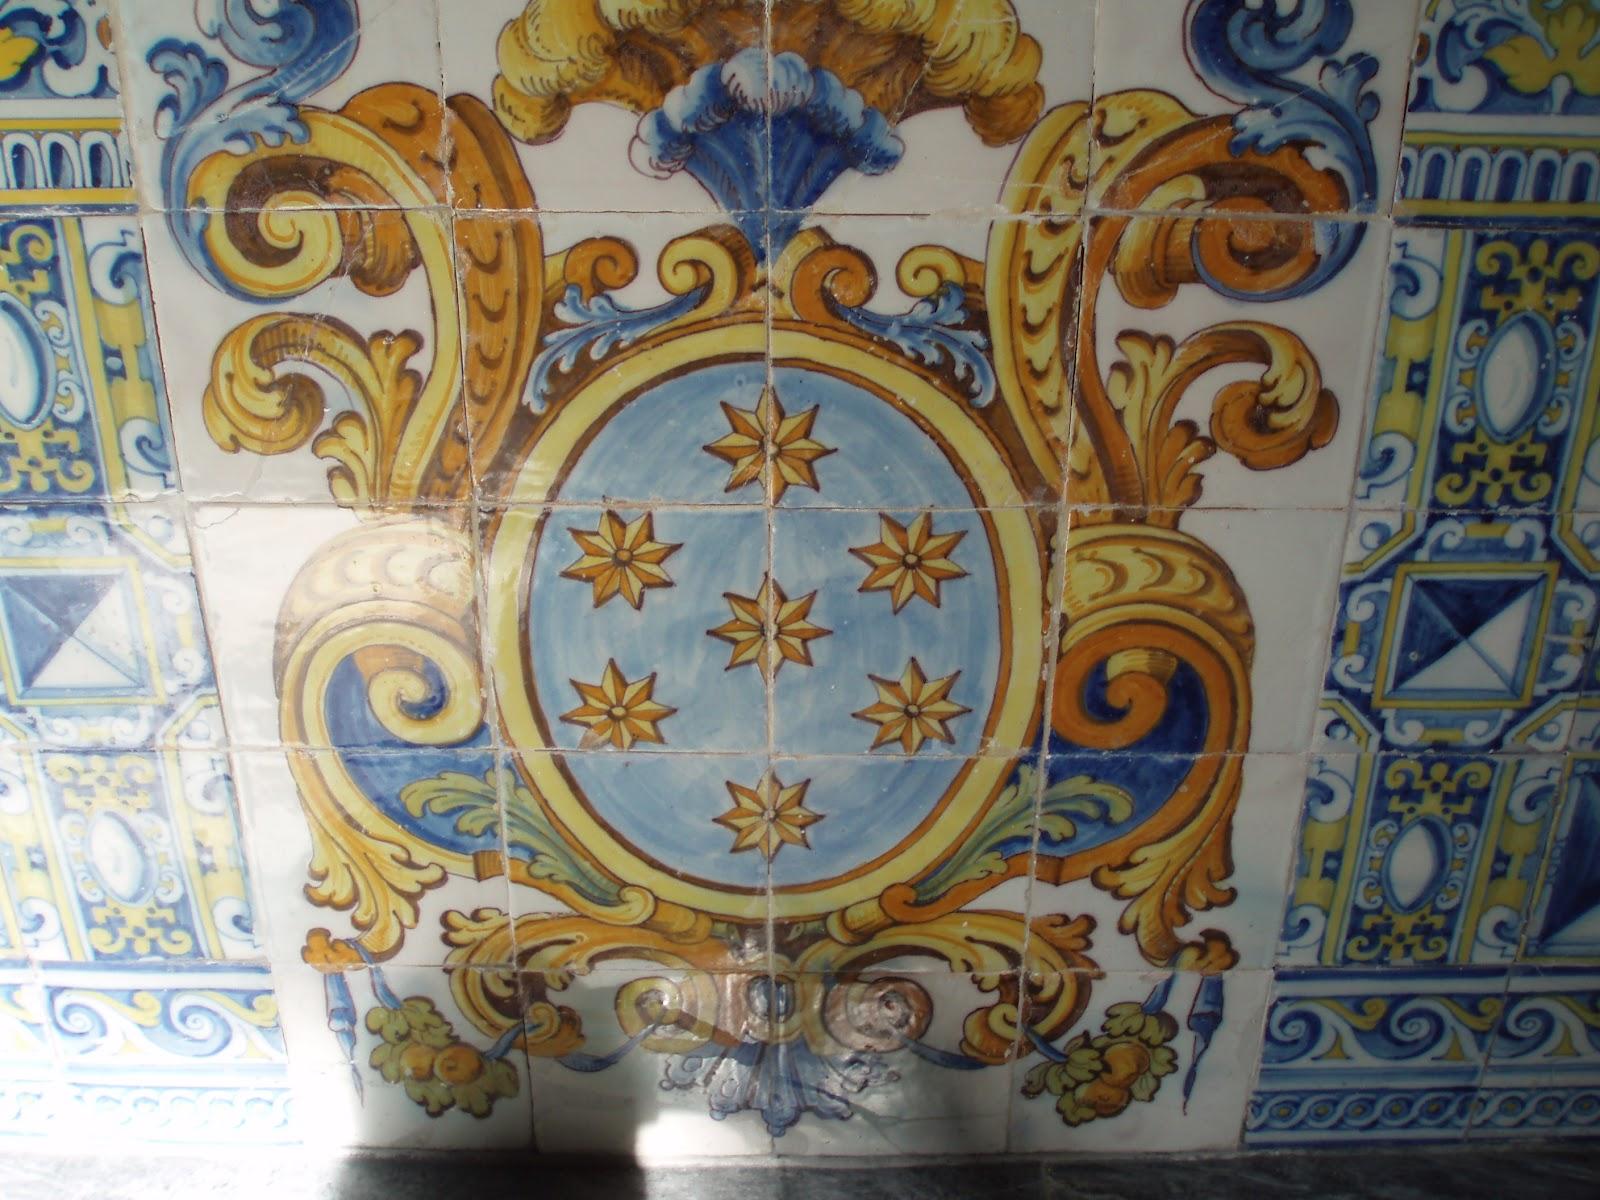 Manuelblas viajes y viajeros monasterio de el paular for Azulejeria antigua cordoba